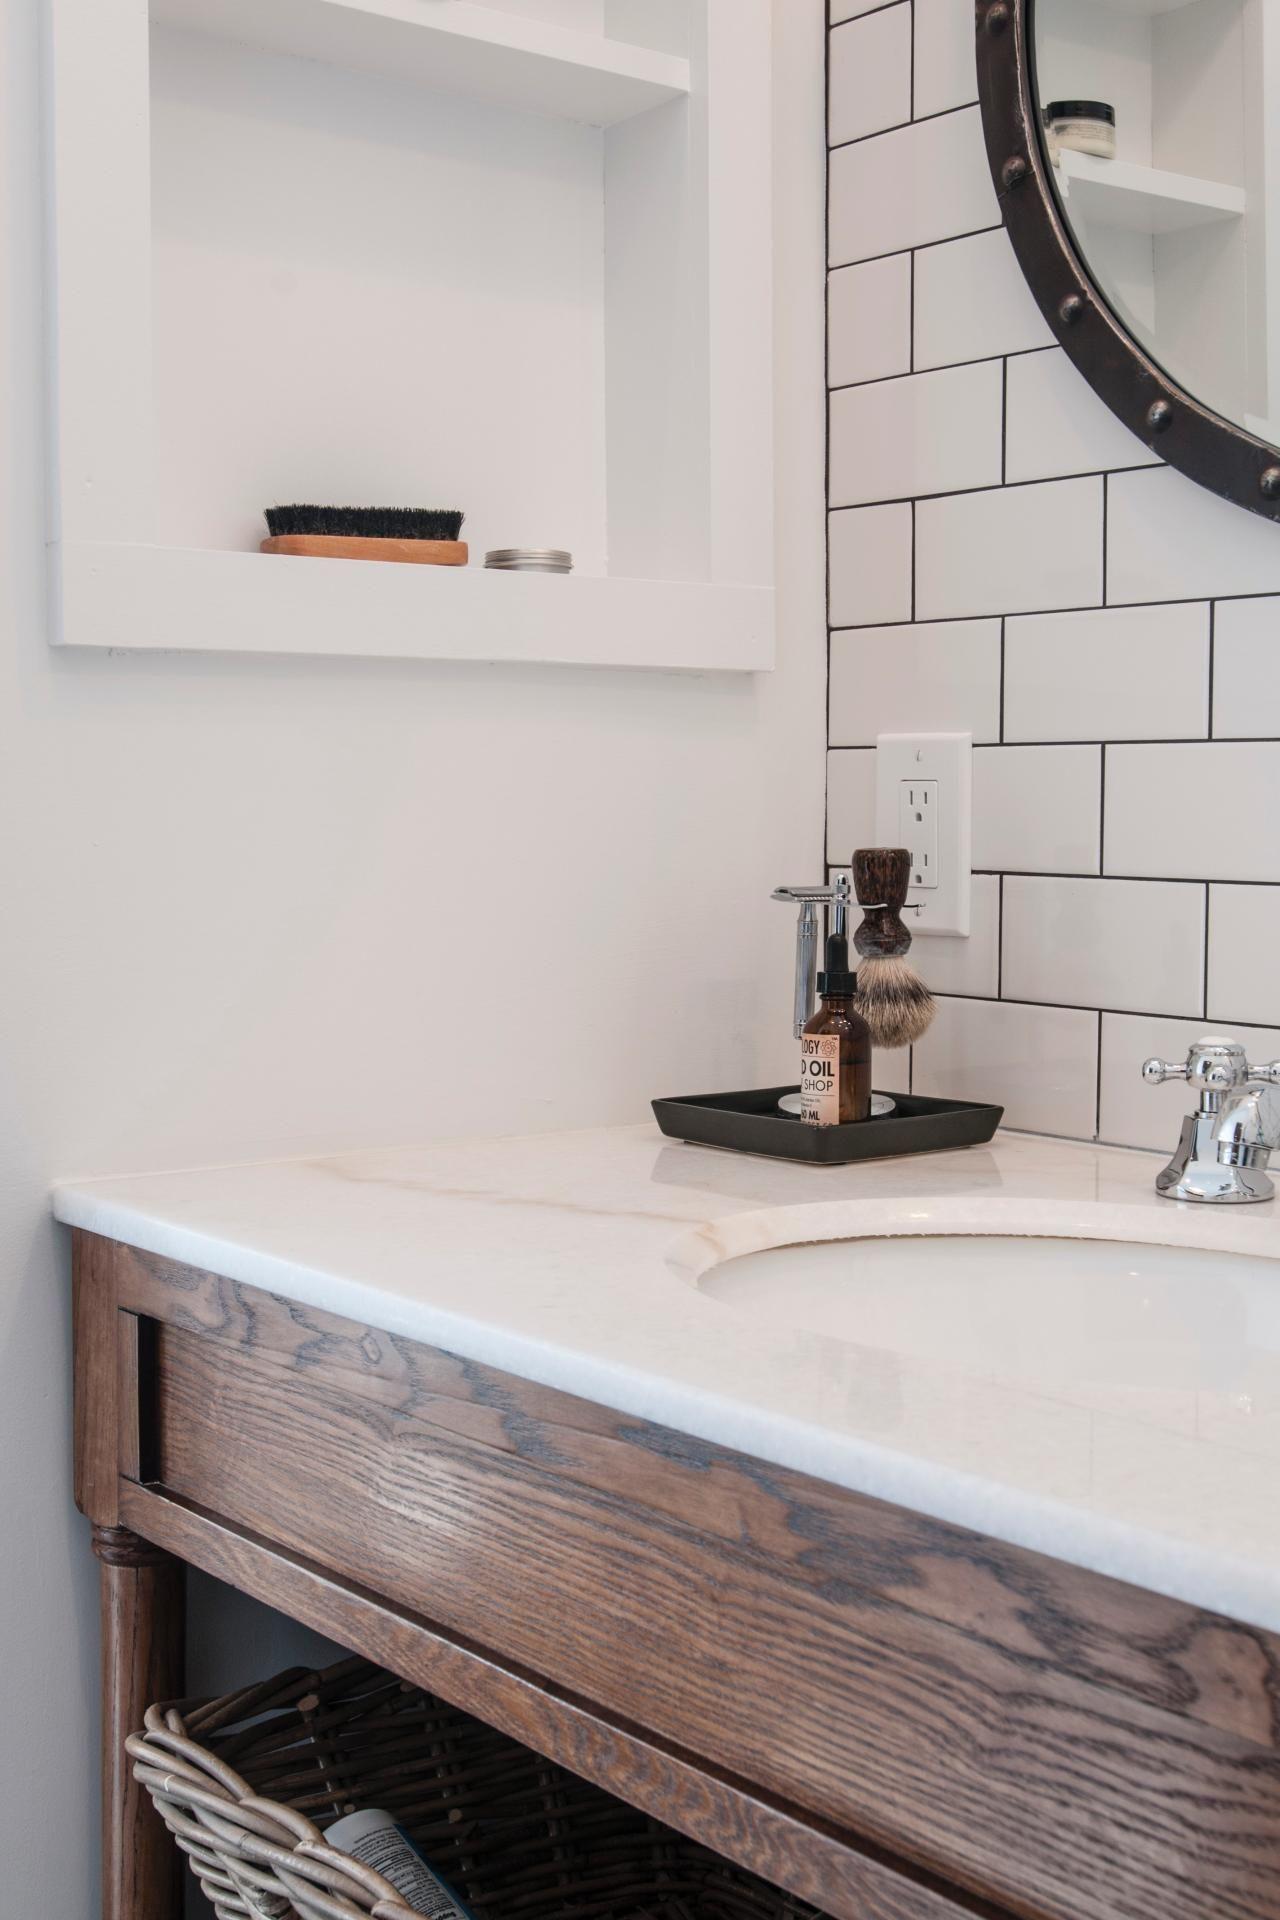 Search Viewer Tile Backsplash Bathroom Vanity Backsplash White